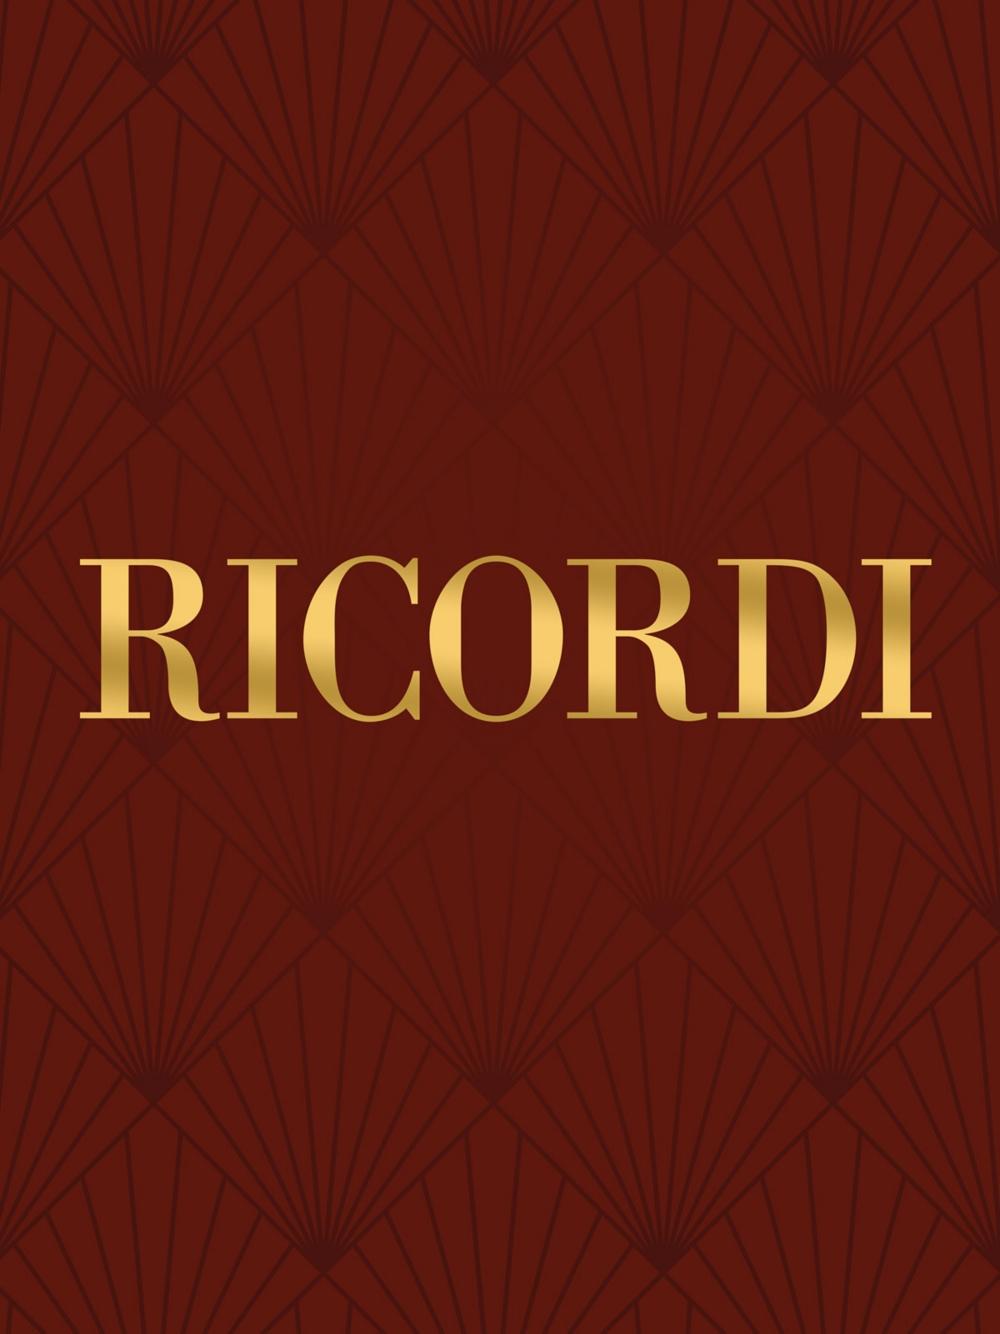 Ricordi Concerto for Clarinet Solo (Carte fiorentine No. 2) Woodwind Series by Valentino... by